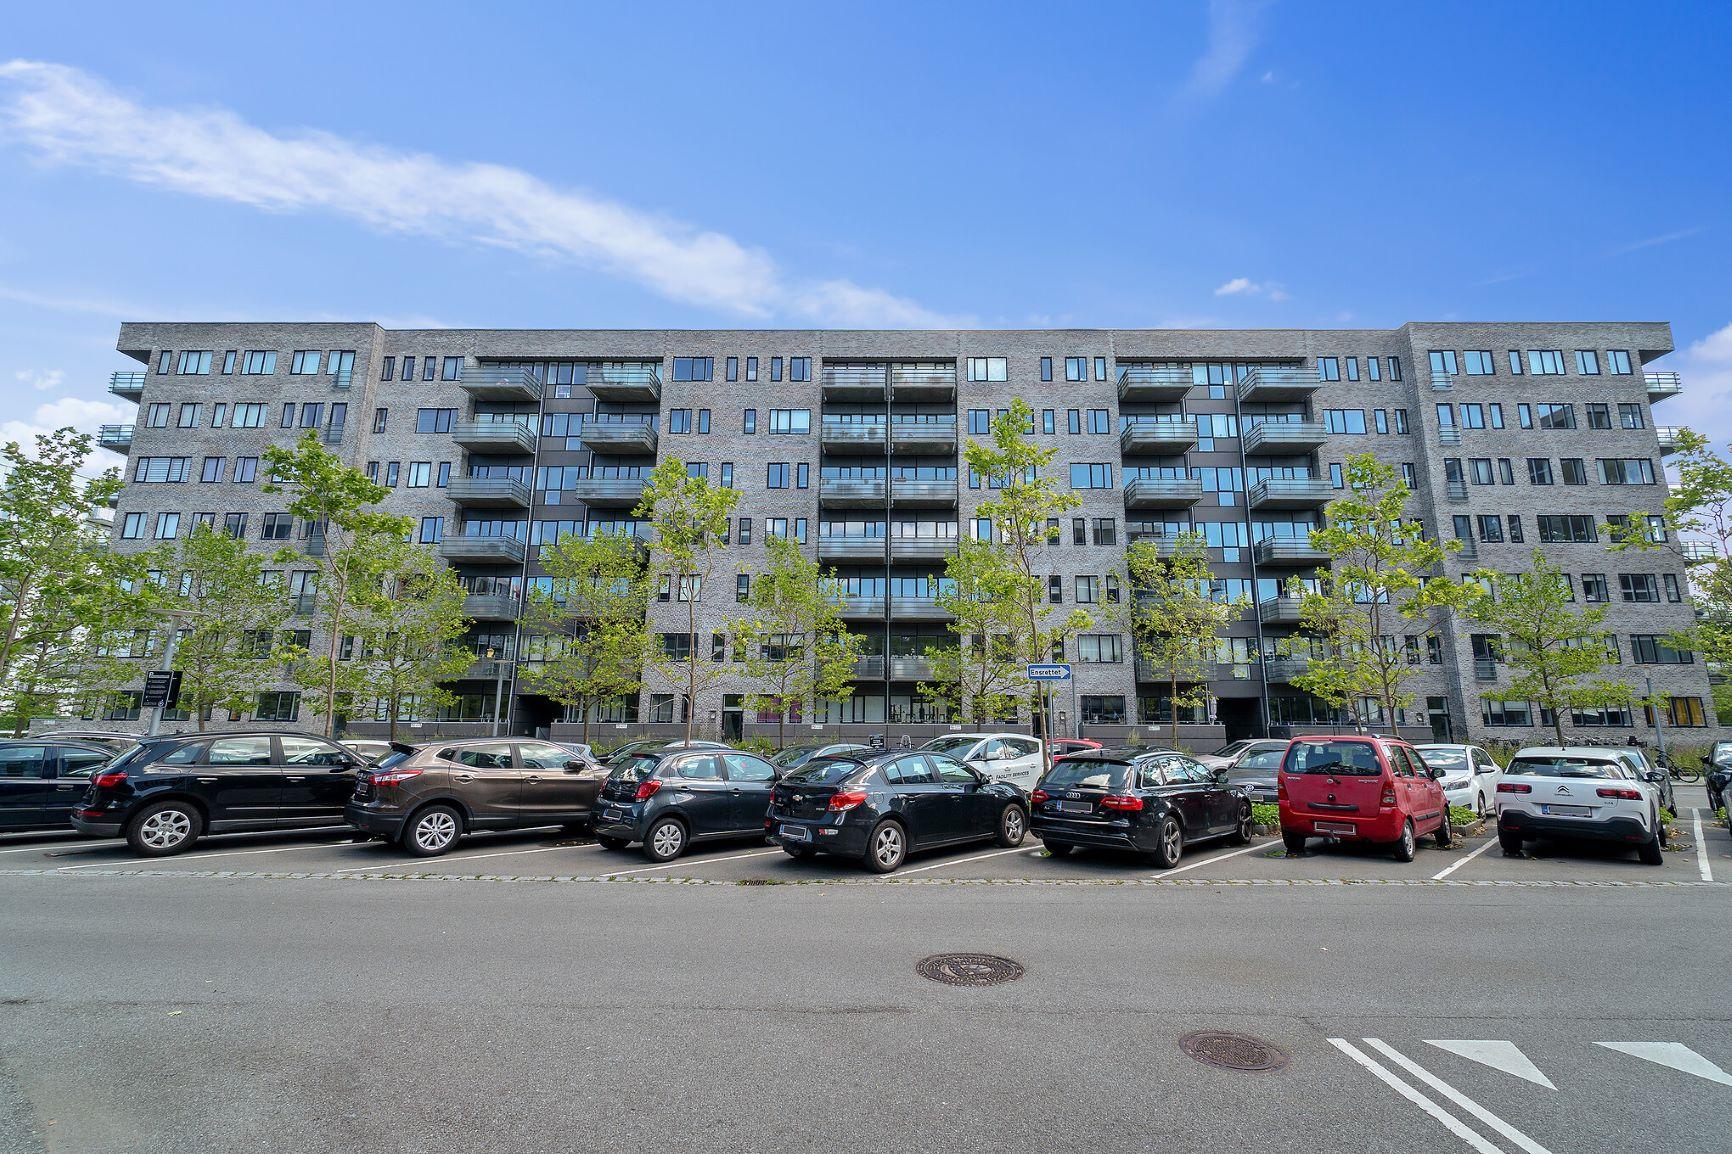 Lejebolig på Gyngemose Parkvej 14, 5. th., 2860 Søborg